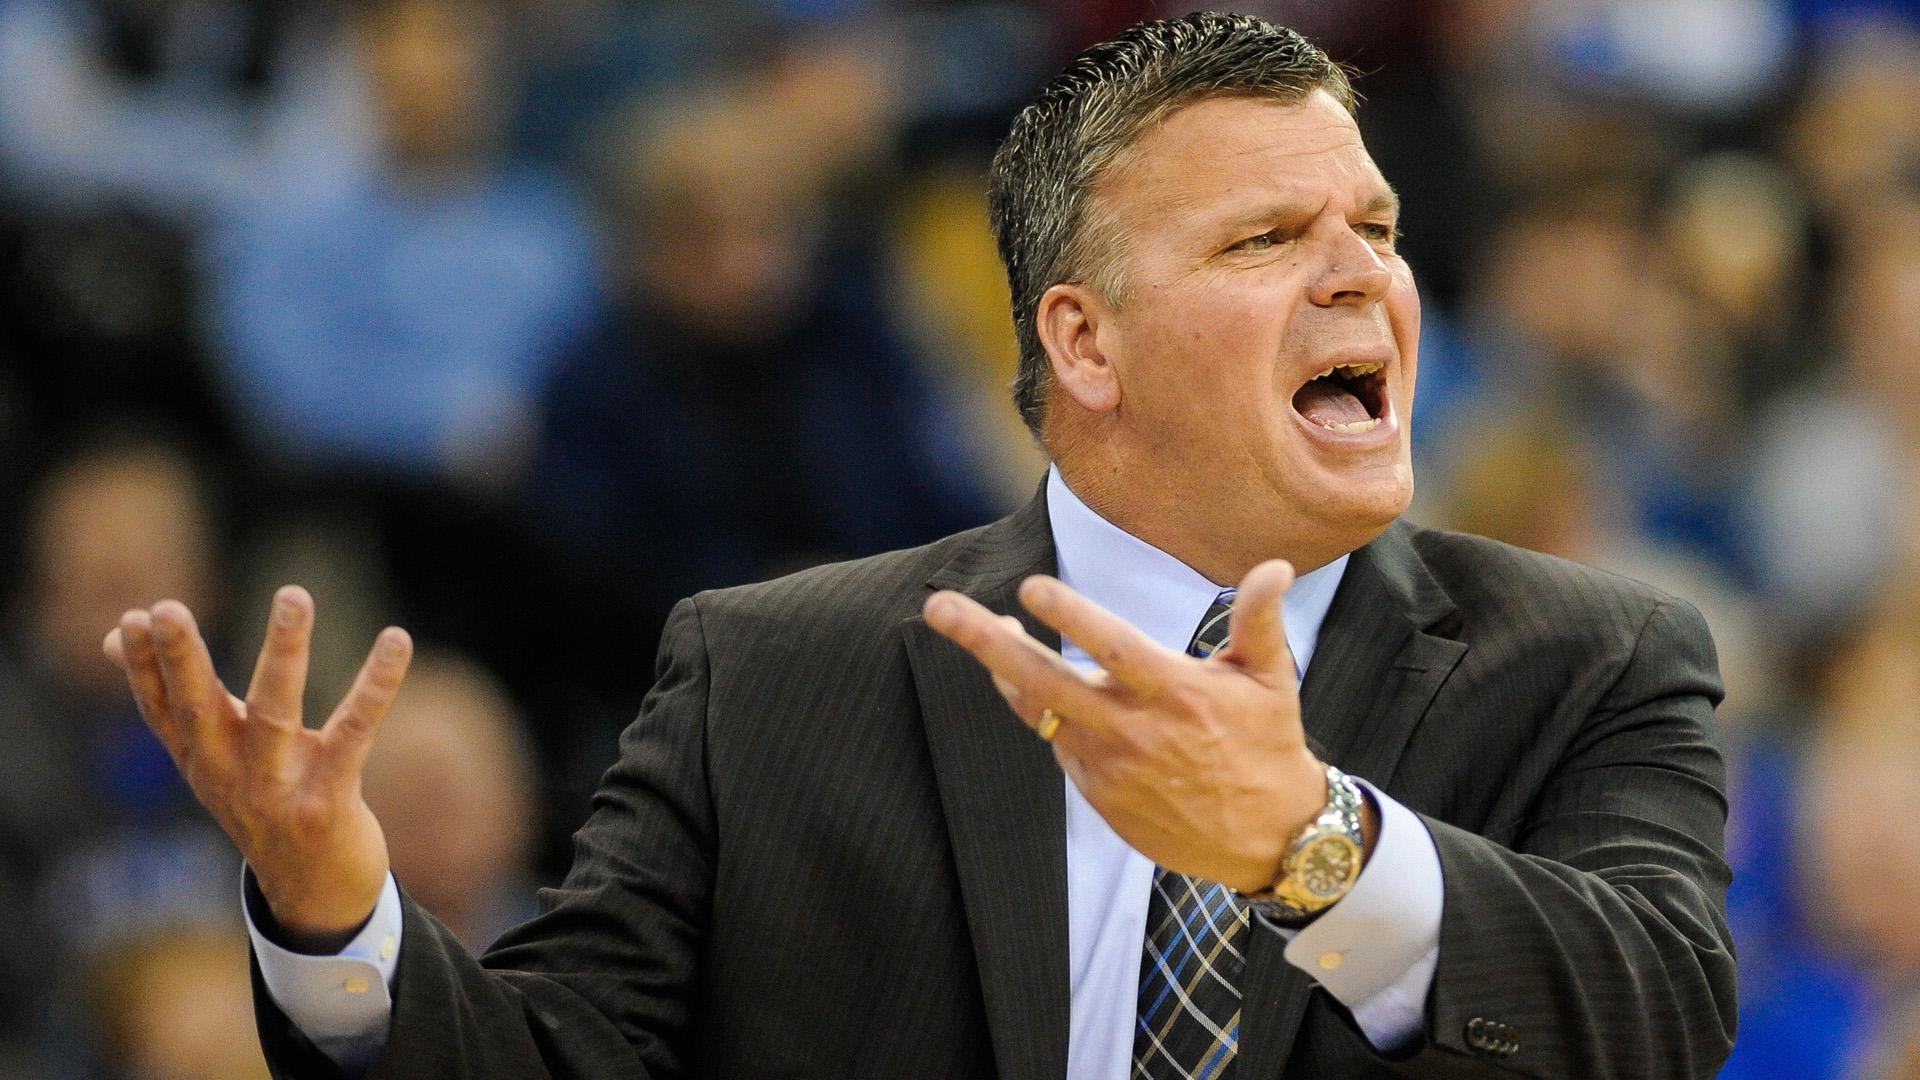 Creighton suspends coach Greg McDermott for 'plantation' speech